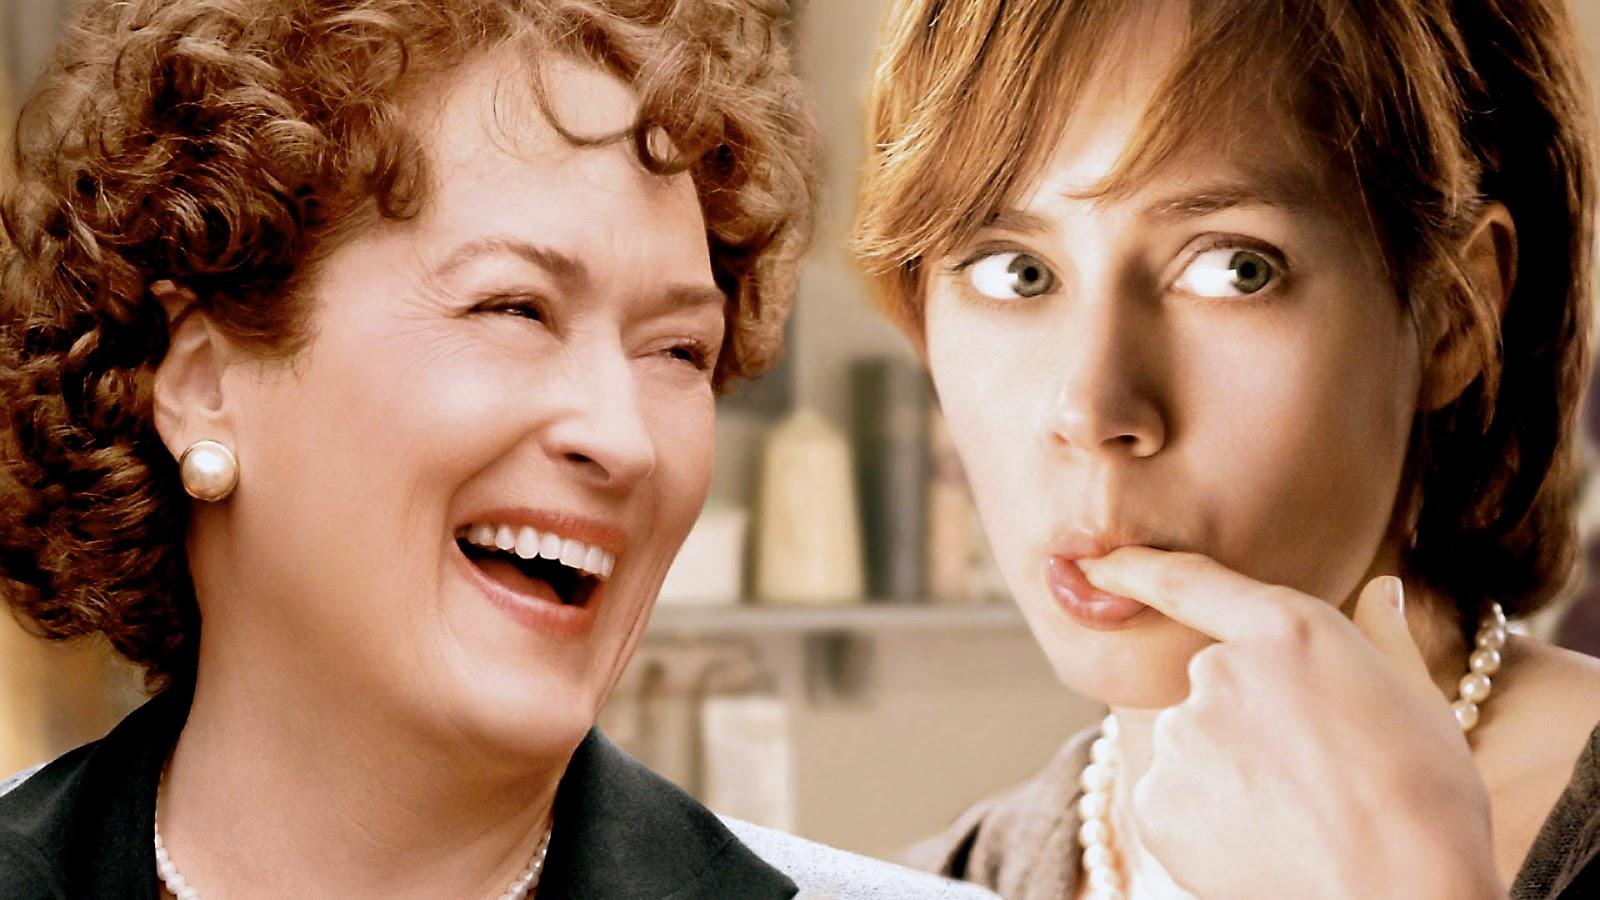 Julie & Julia plays in Millennium Park on Tuesday 6/27.